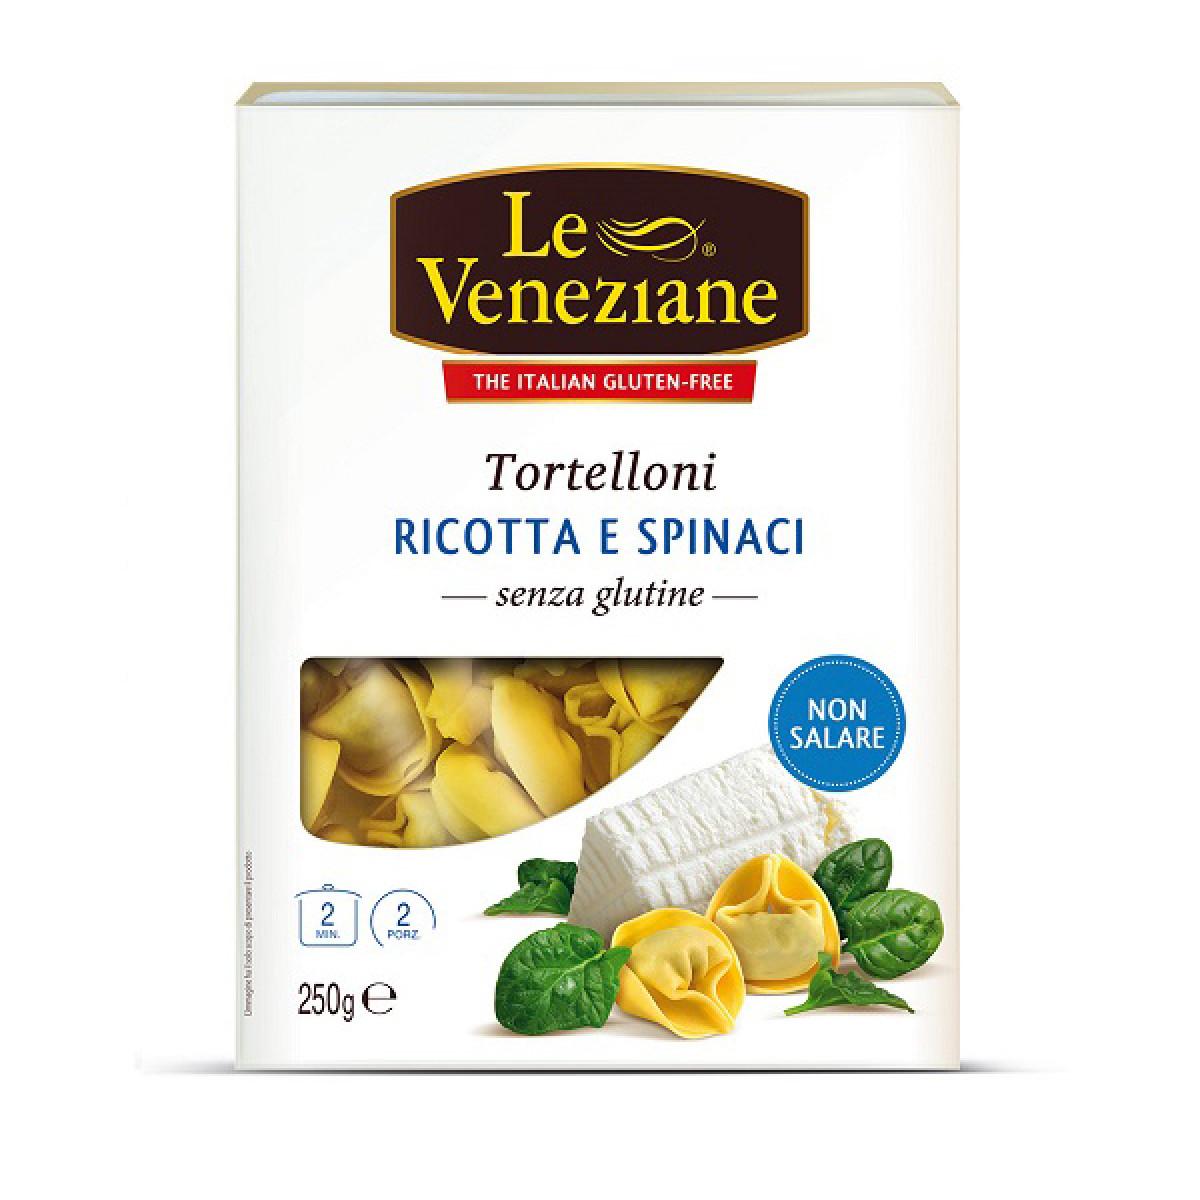 Tortelloni Ricotta & Spinazie